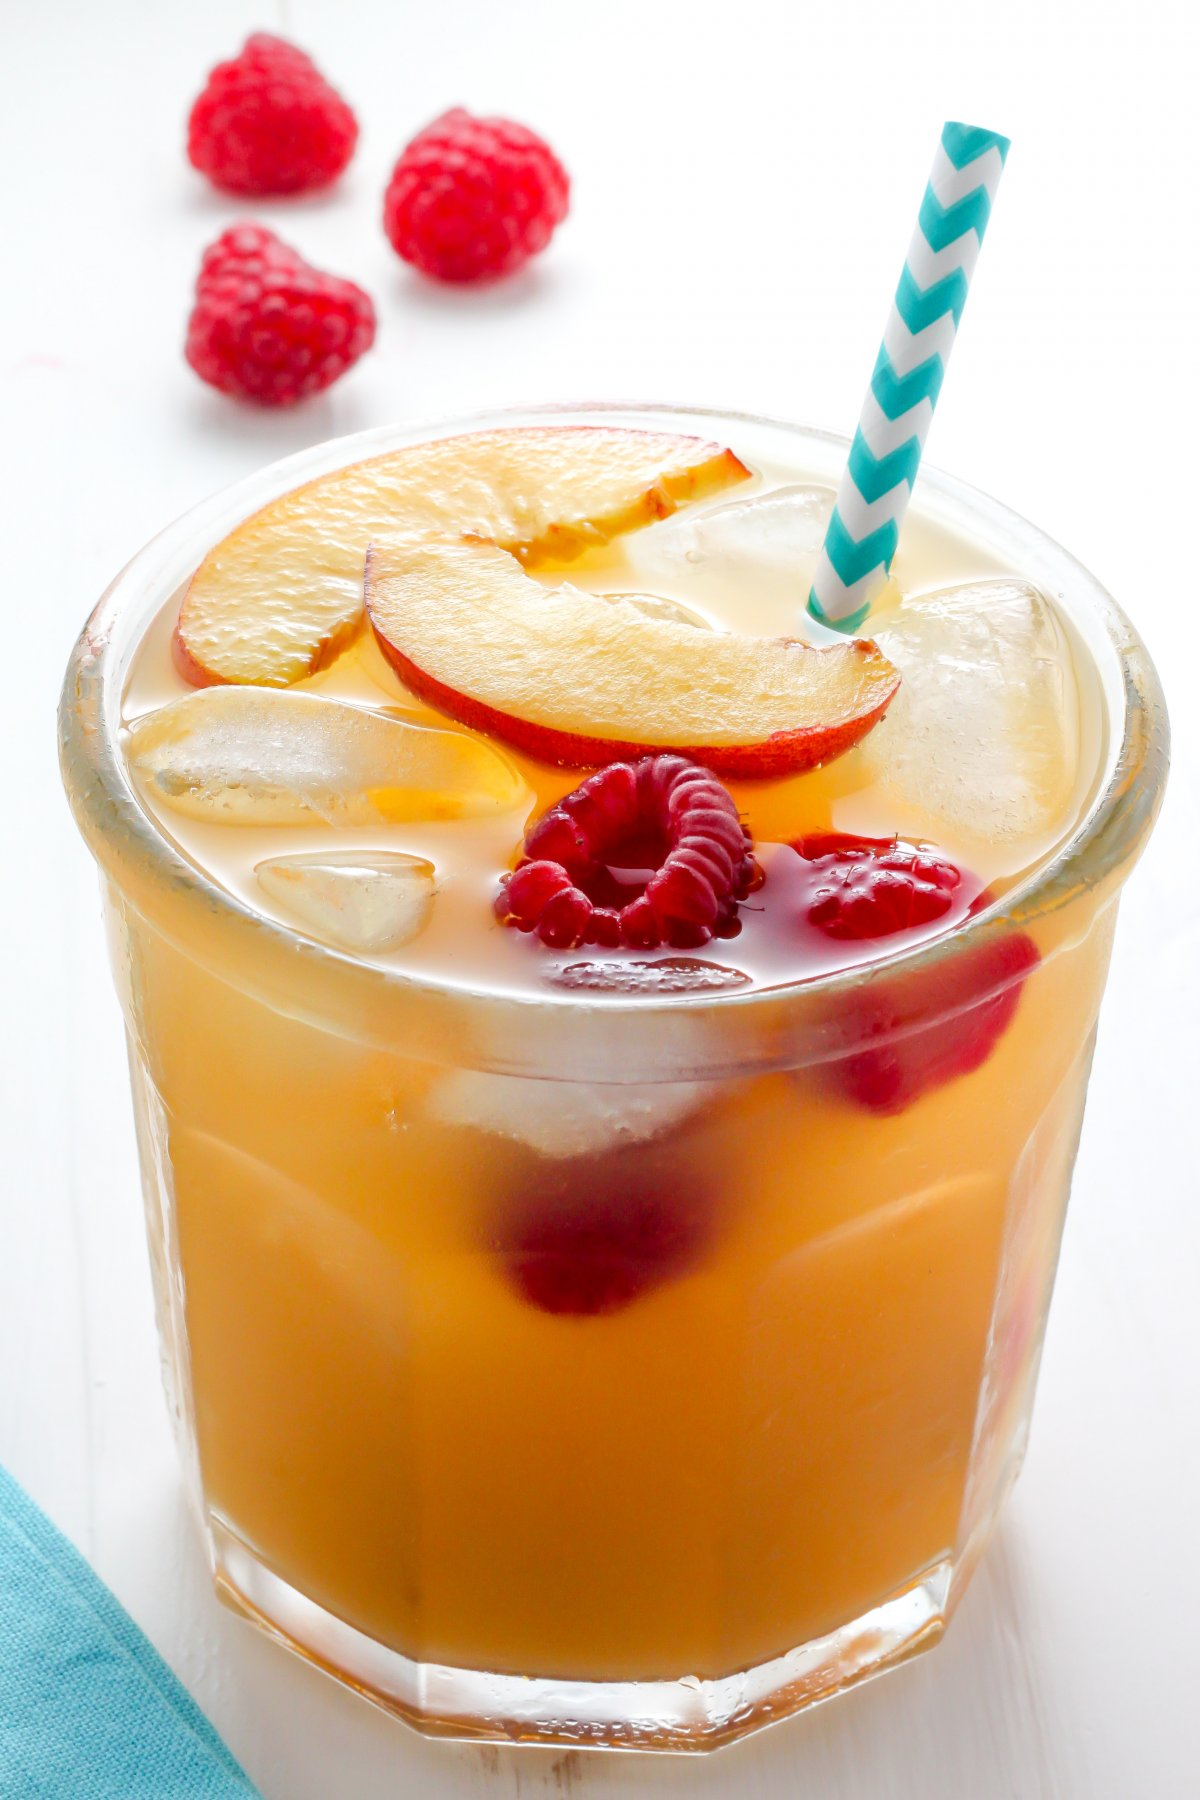 peach puree, red raspberries, black tea, and fresh squeezed lemonade ...